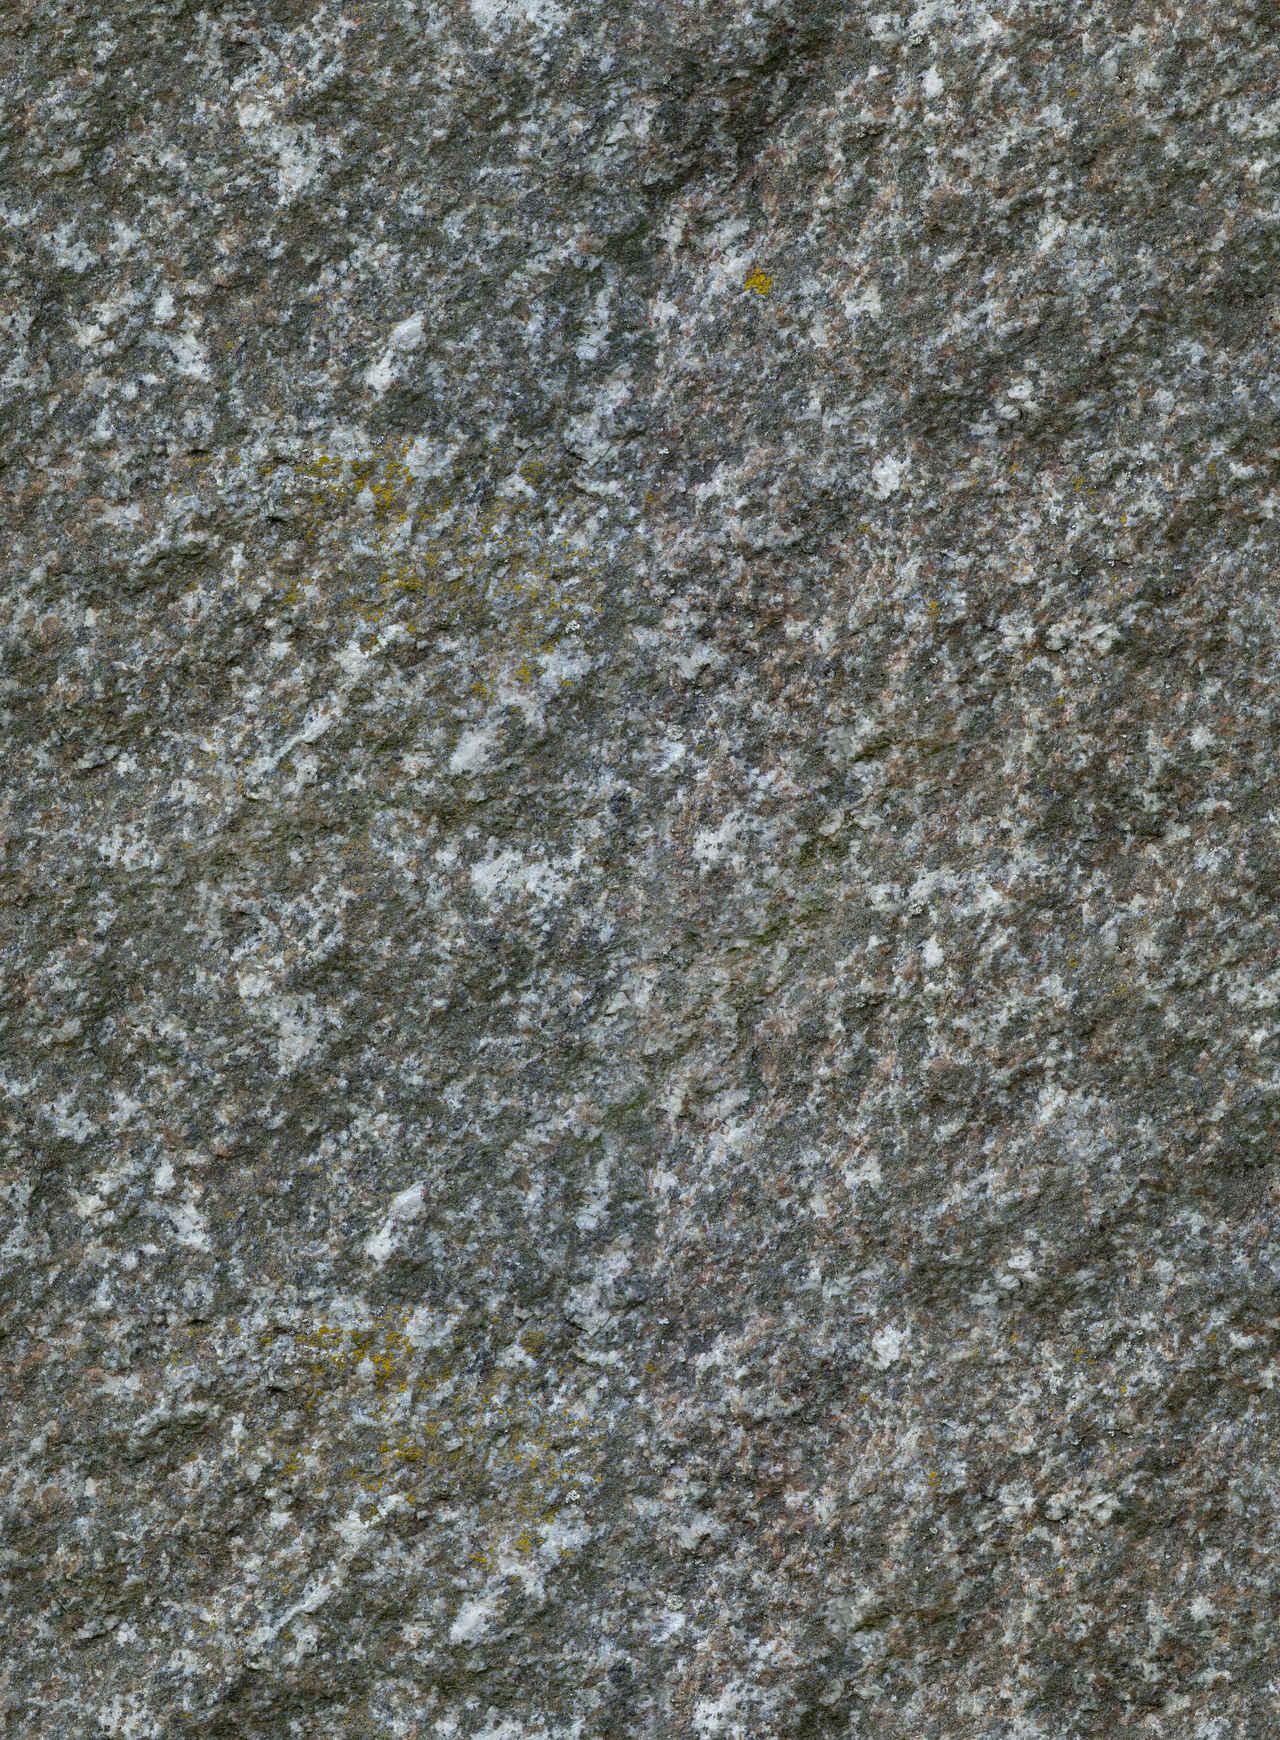 Naturally Rough Granite Stone Seamless Texture